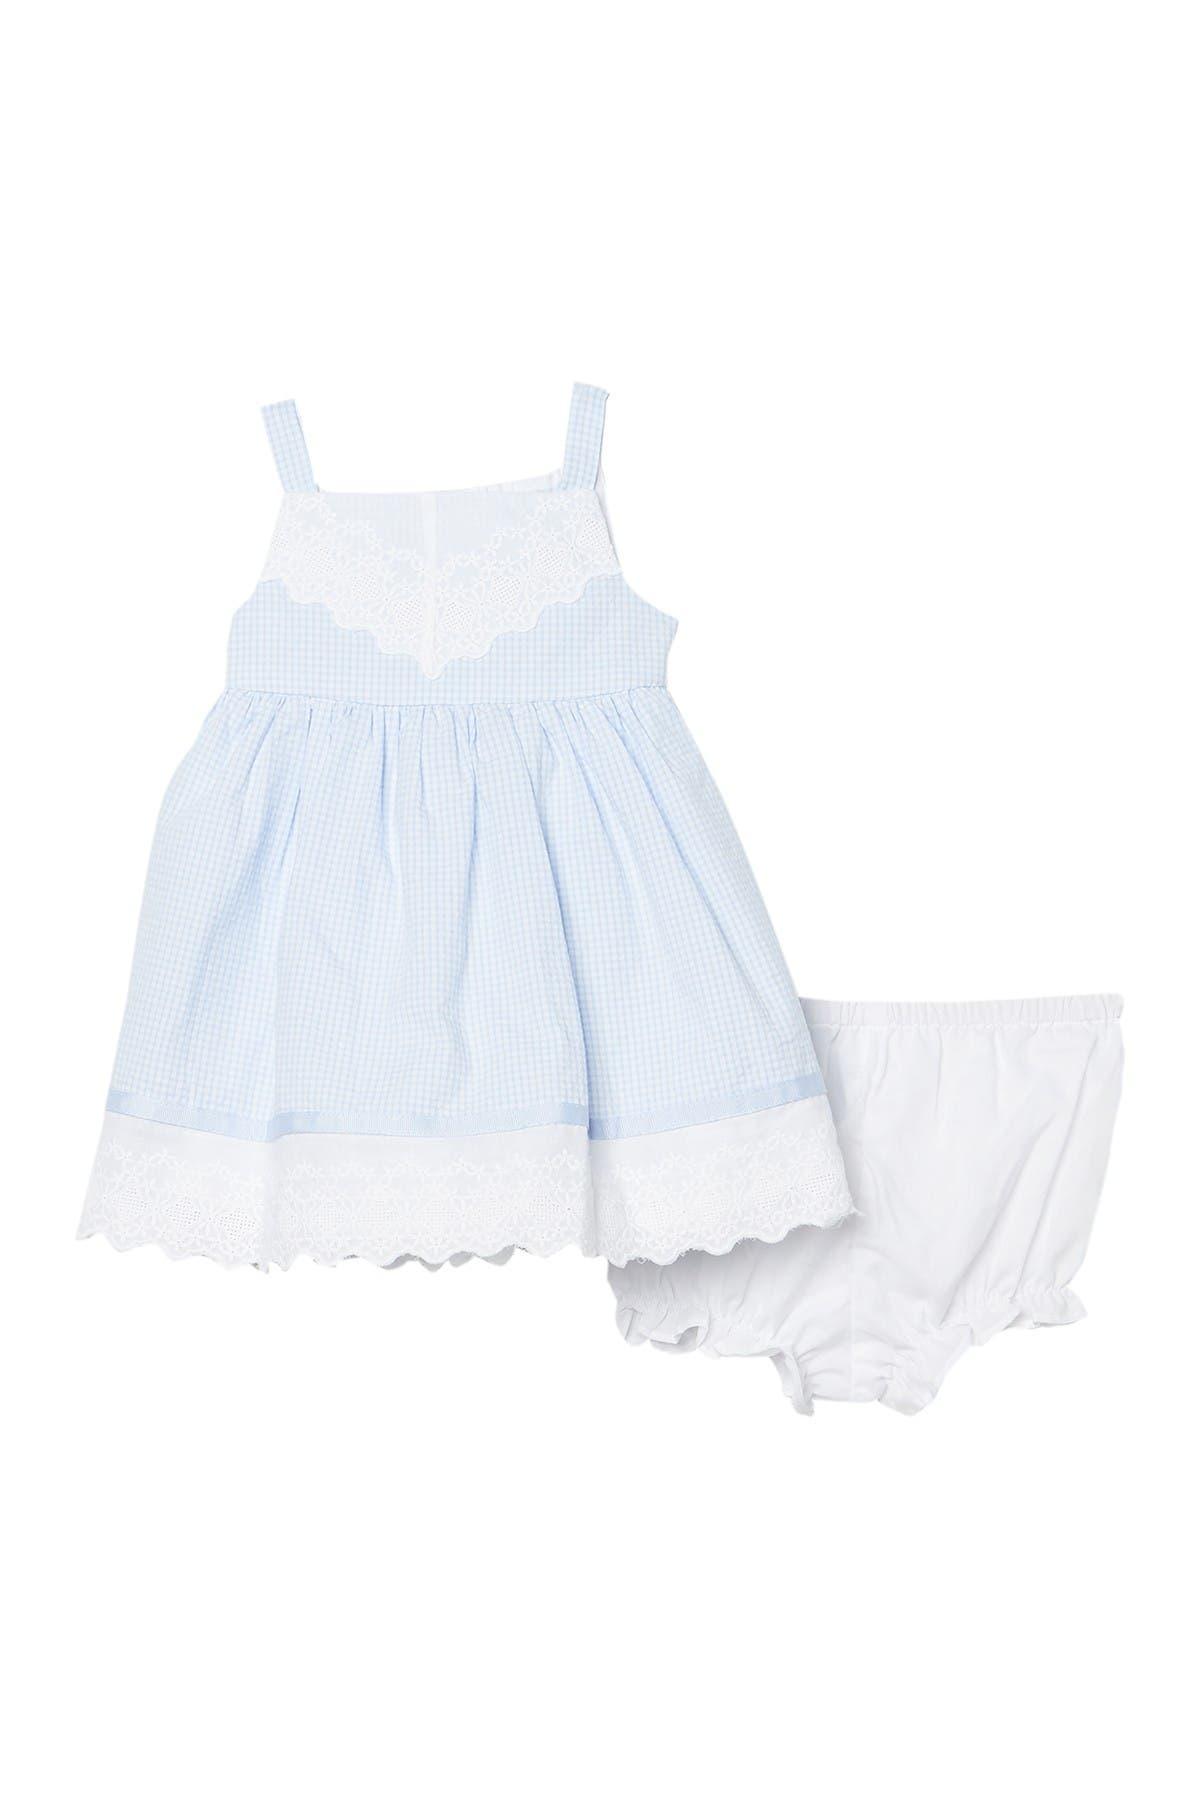 Image of Pippa & Julie Gingham Seersucker 2-Piece Dress & Bloomers Set